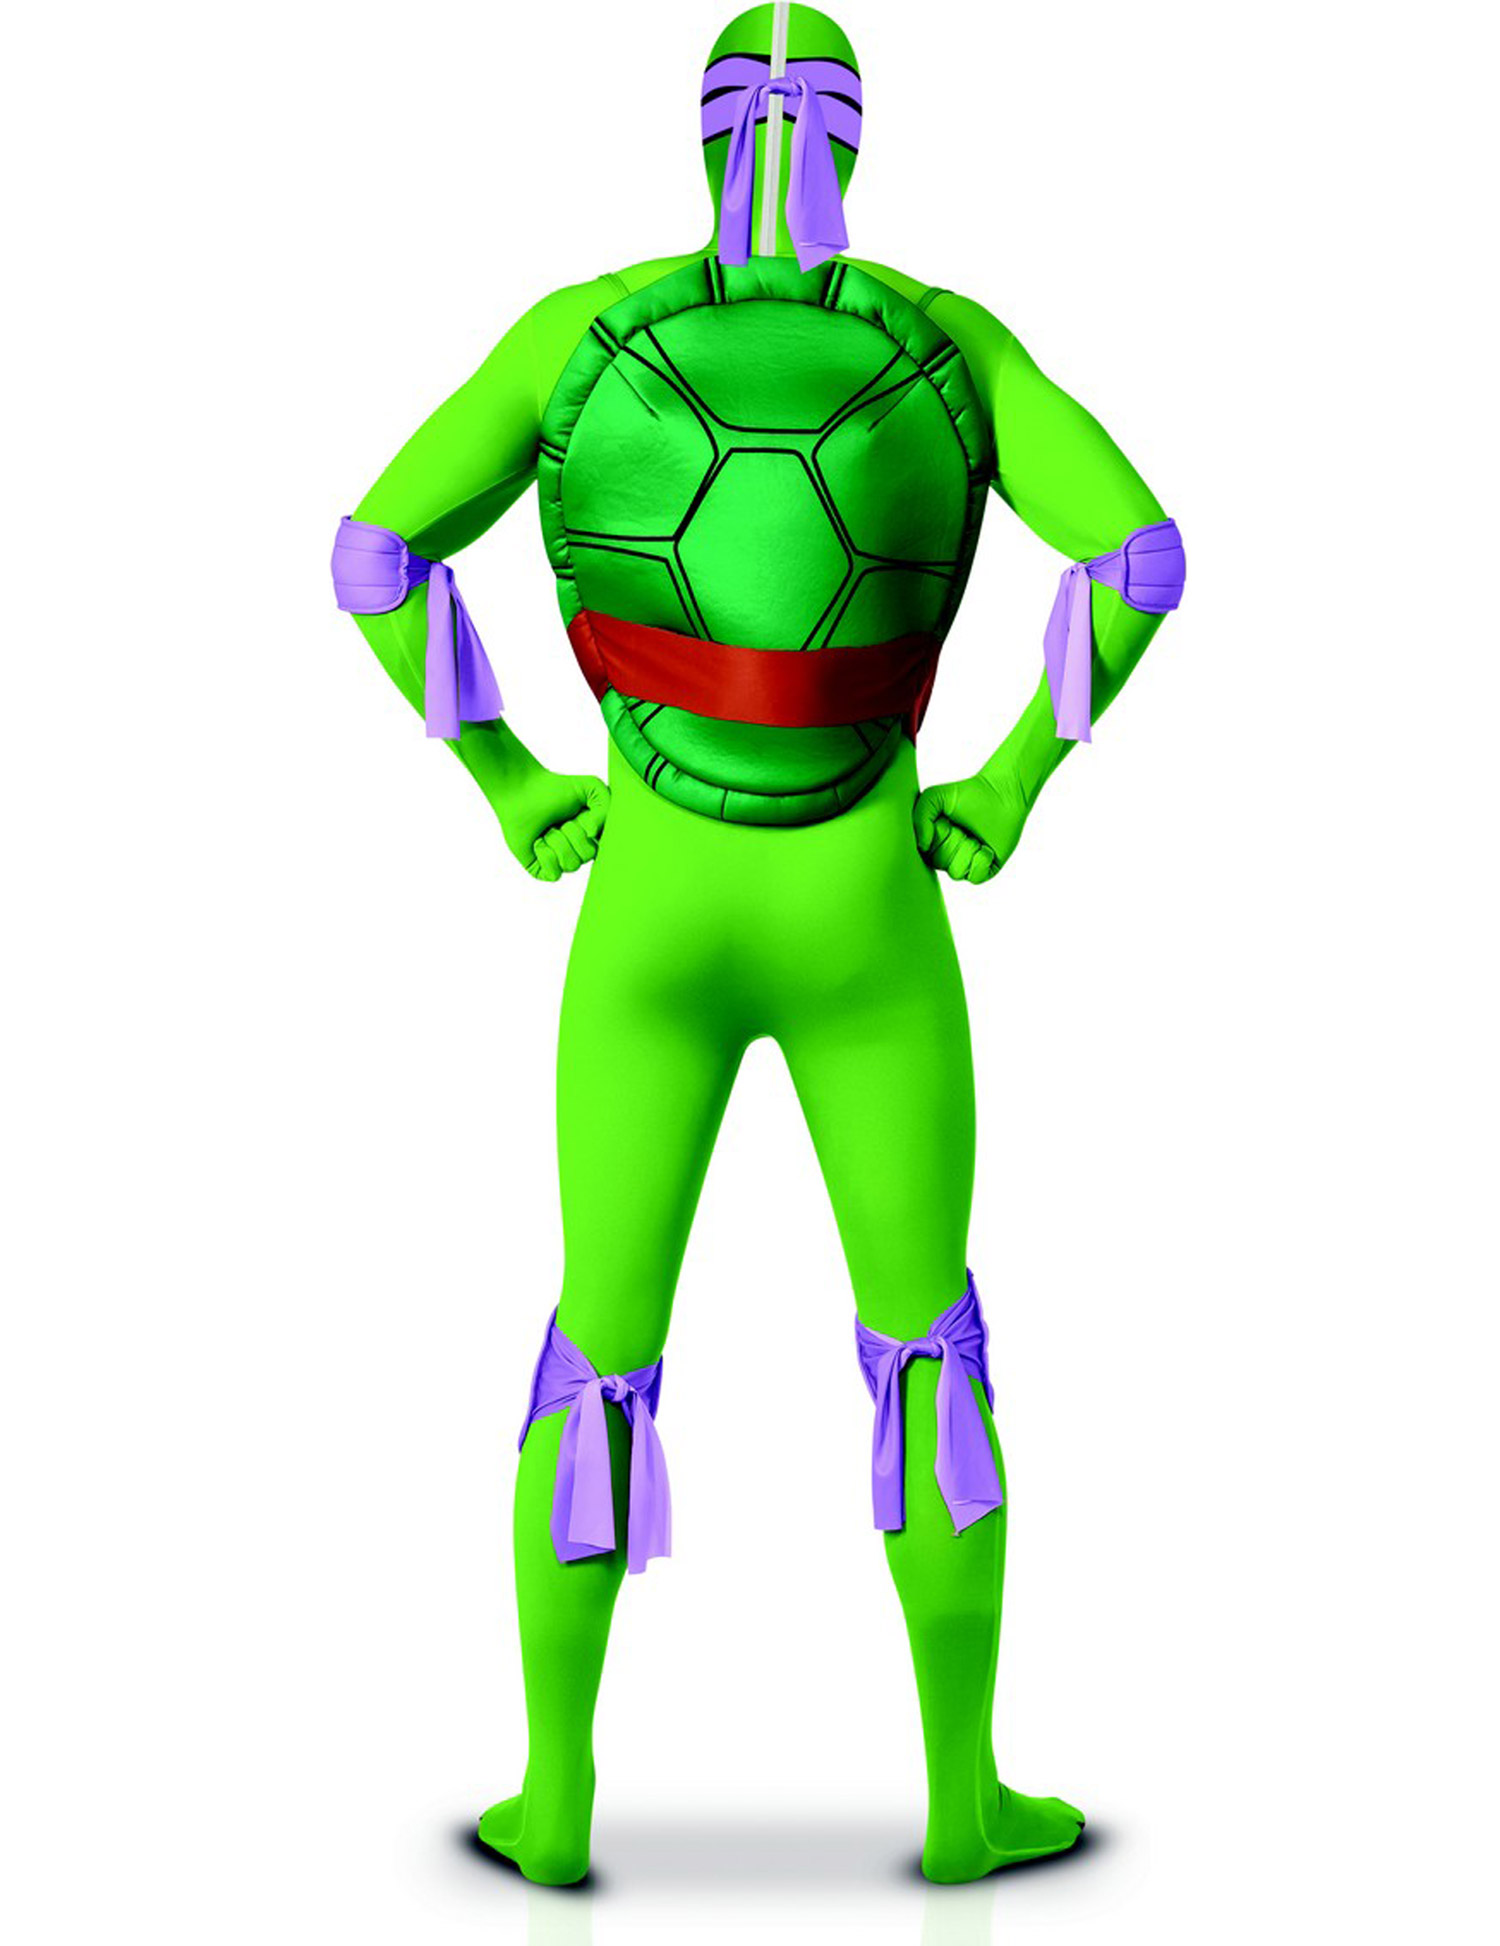 Déguisement seconde peau Donatello Tortues Ninja™ adulte   Deguise ... 78b10f8cf7a5